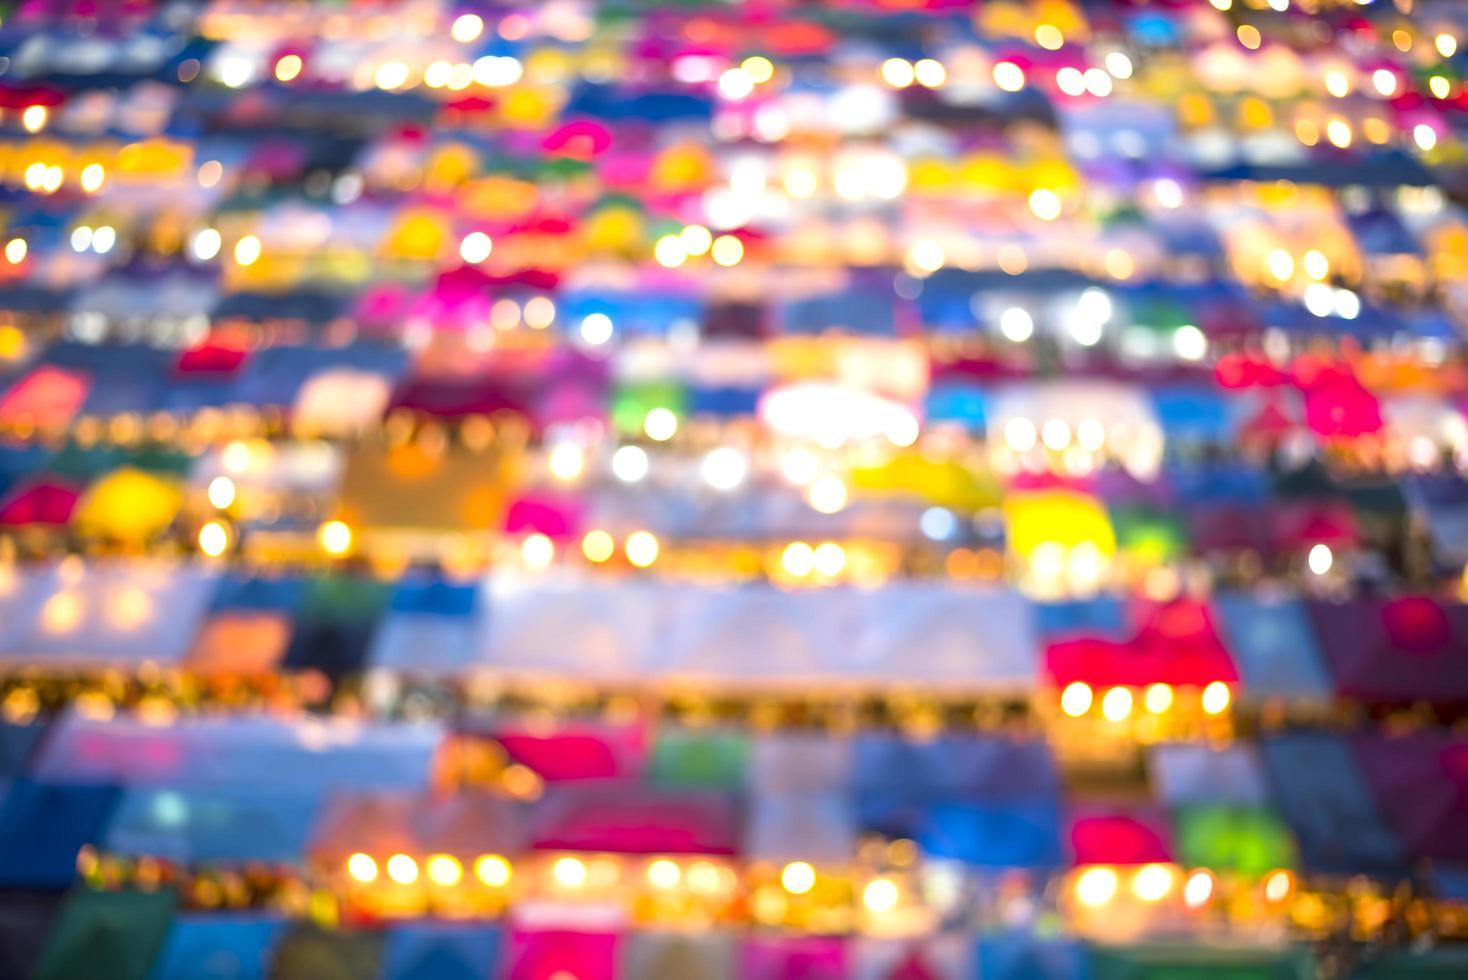 Colorful outdoor market bokeh photo